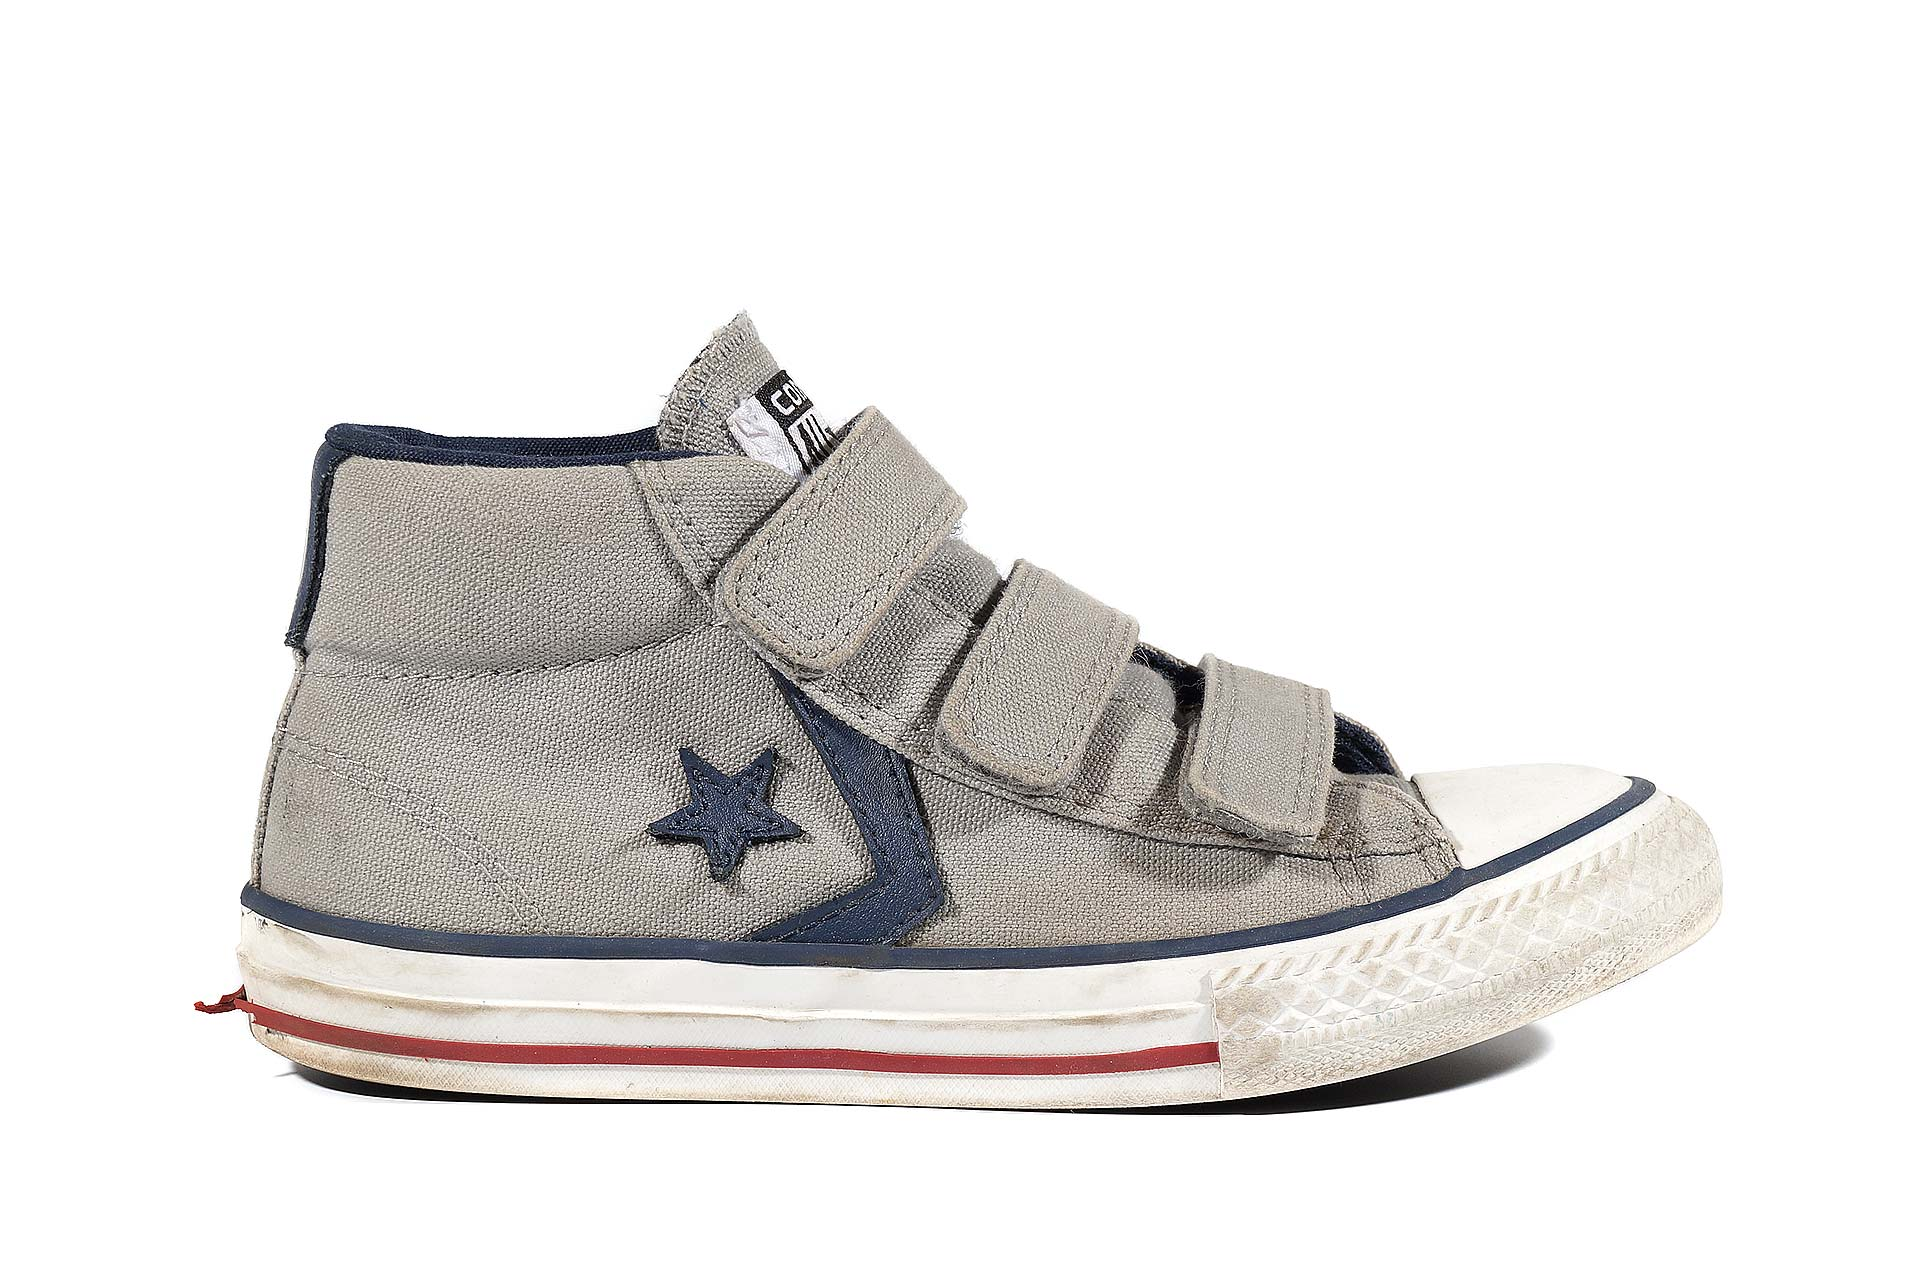 Детские кеды Converse Star Player 637334 (00013-U) купить за 1599р ... b8e683028a9